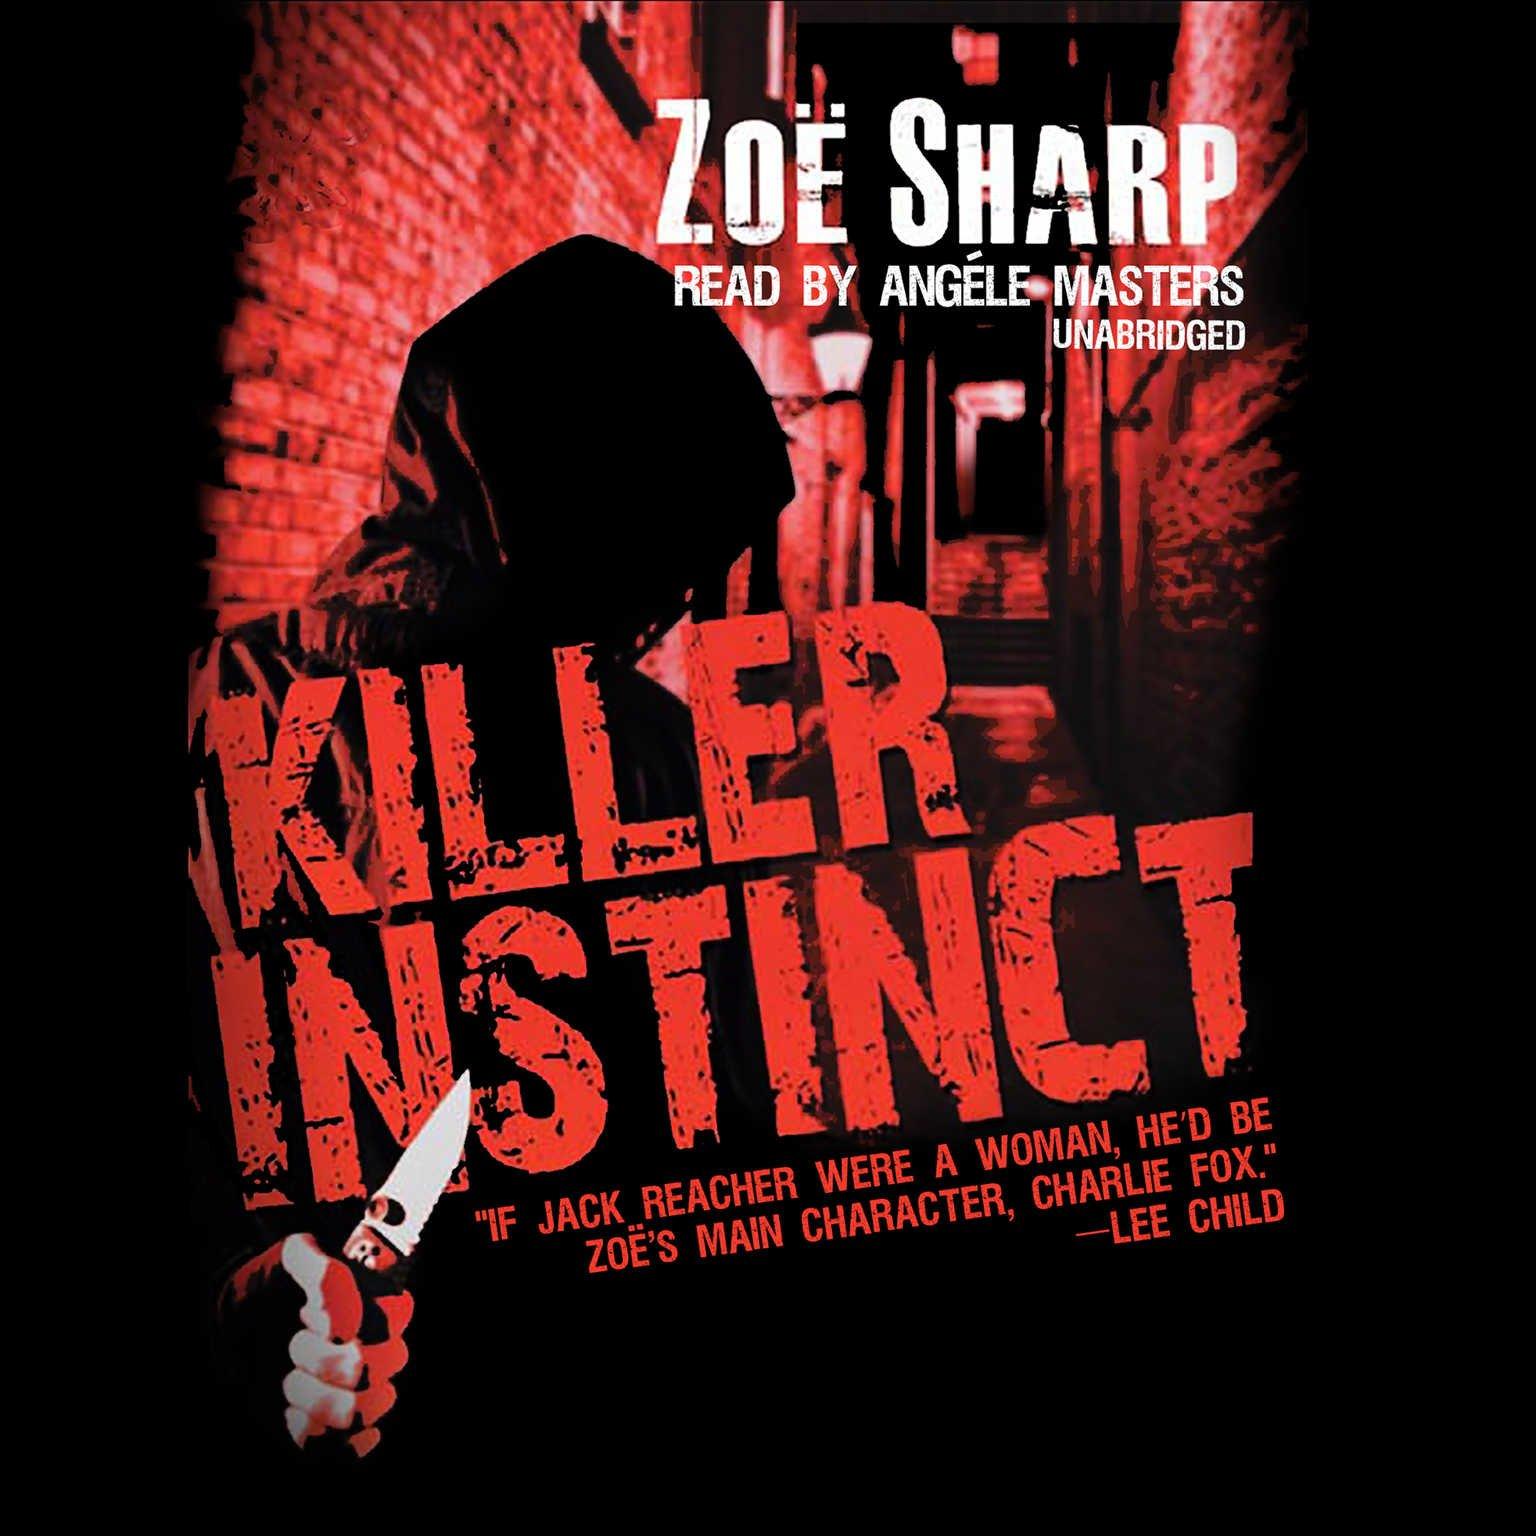 Killer Instinct  (Charlie Fox Series, Book 1) pdf